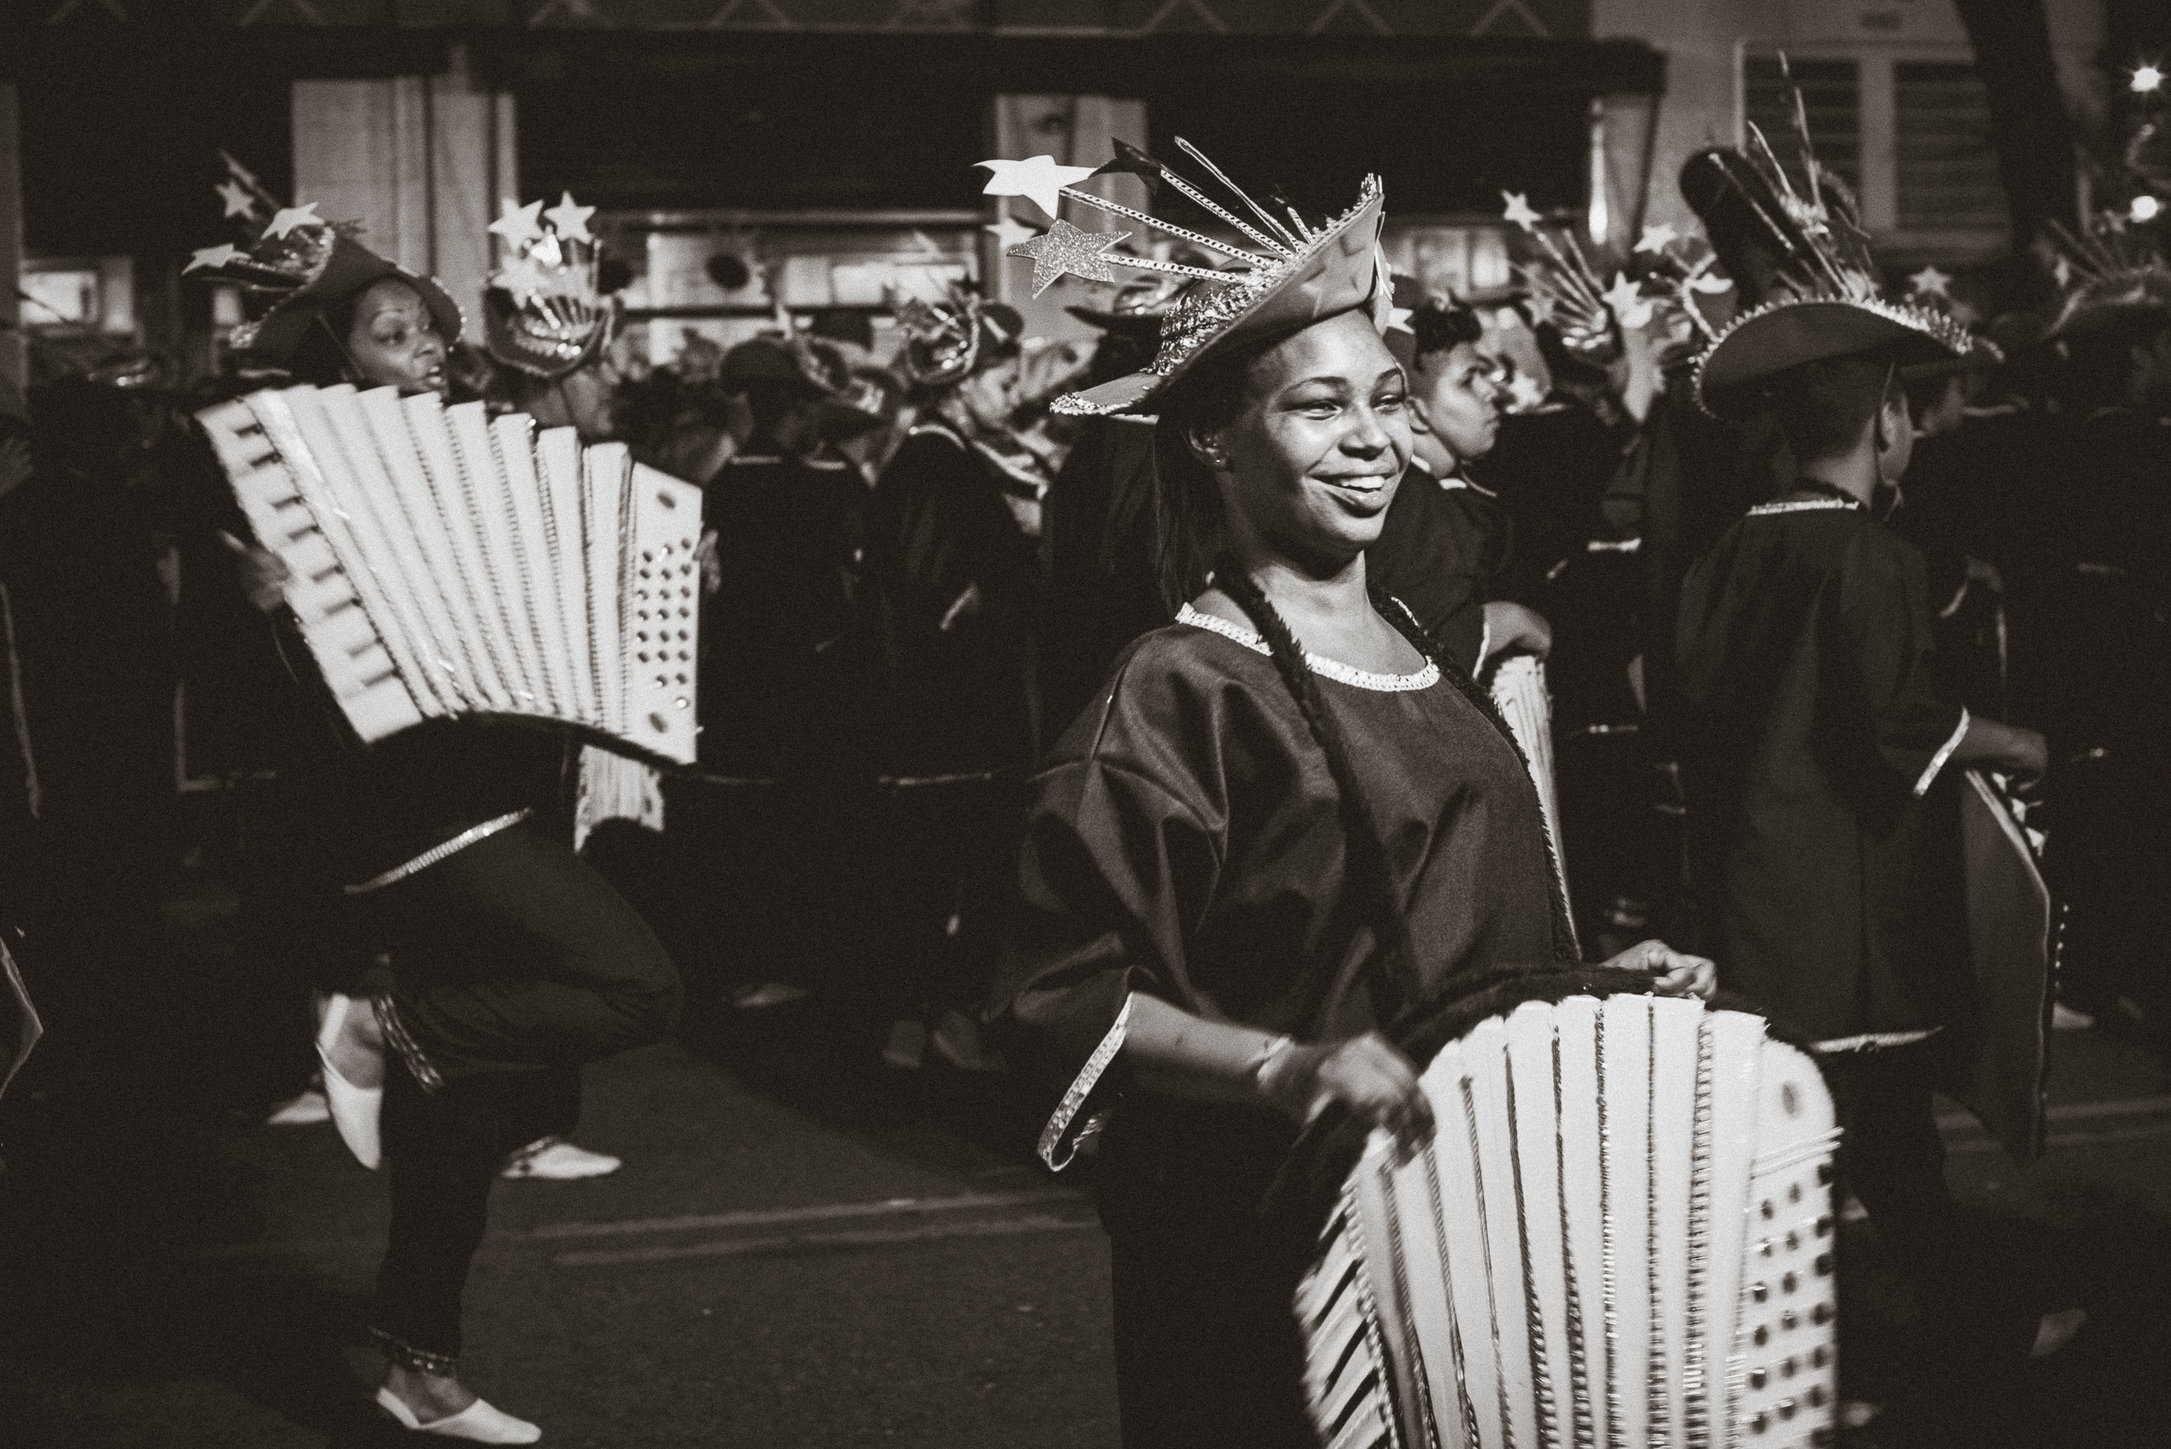 20180211-Carnaval-161.jpg